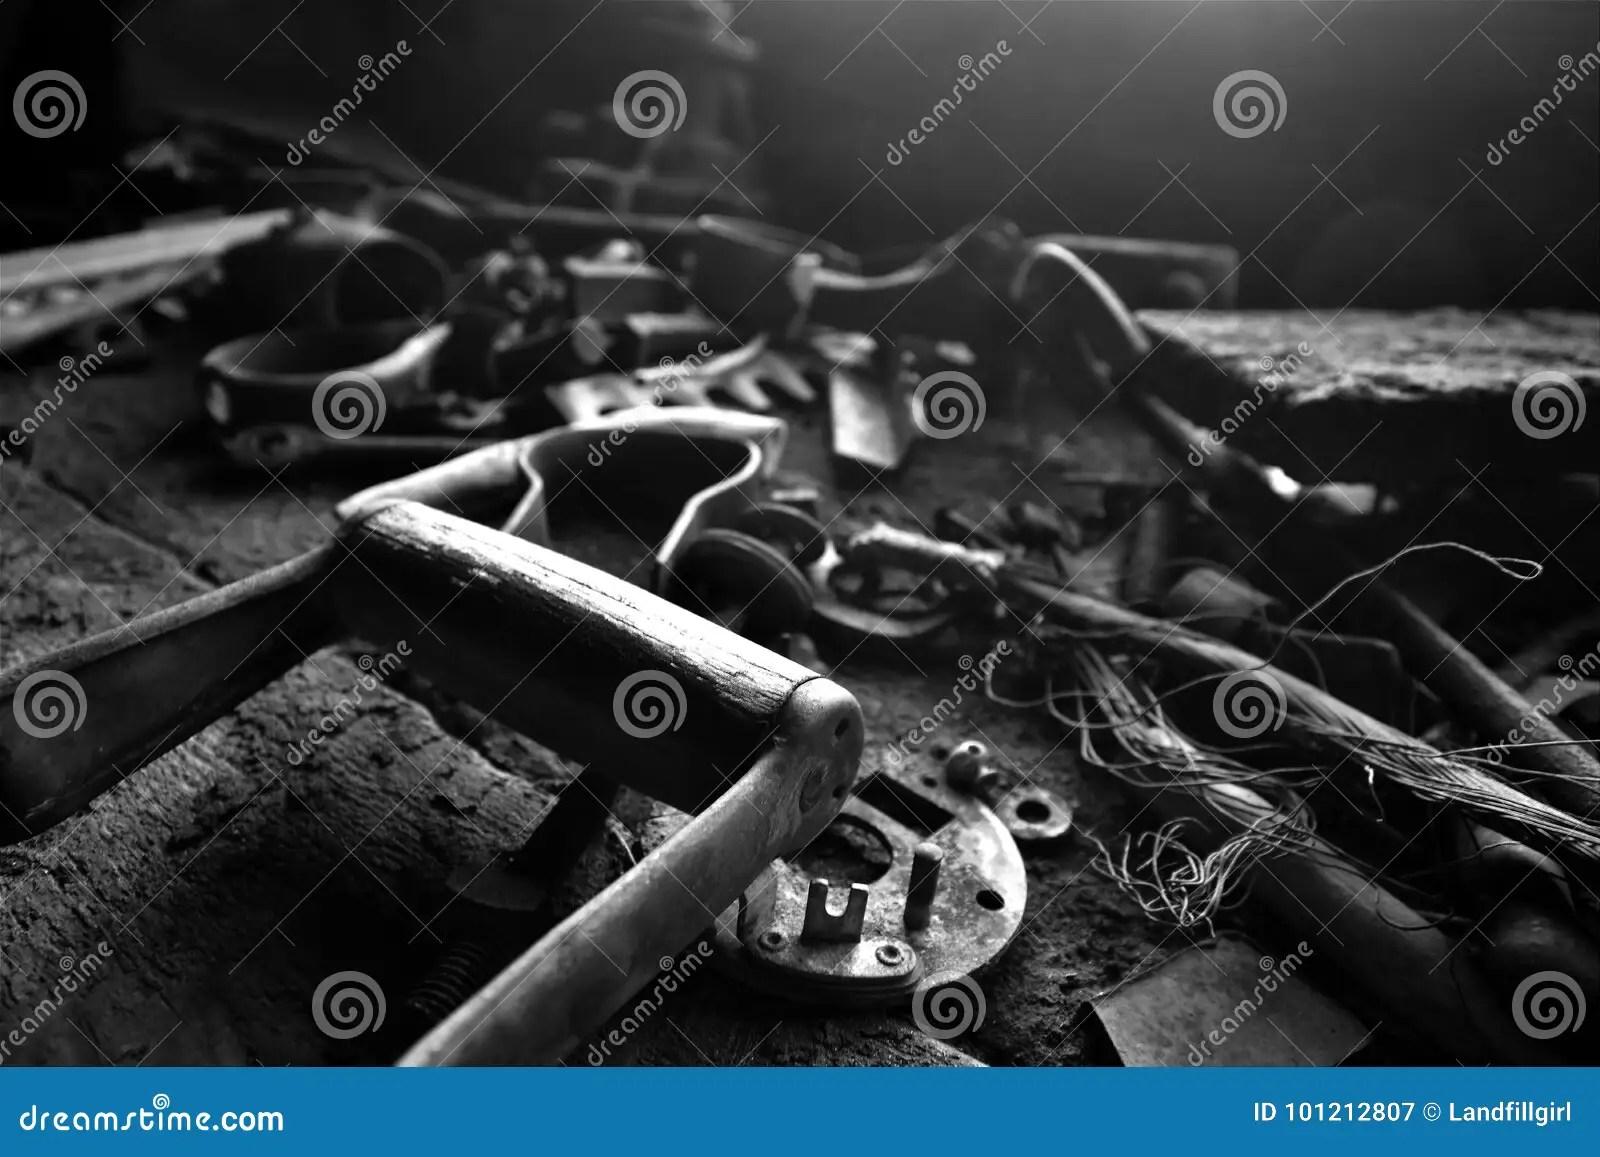 Old Antique Tools